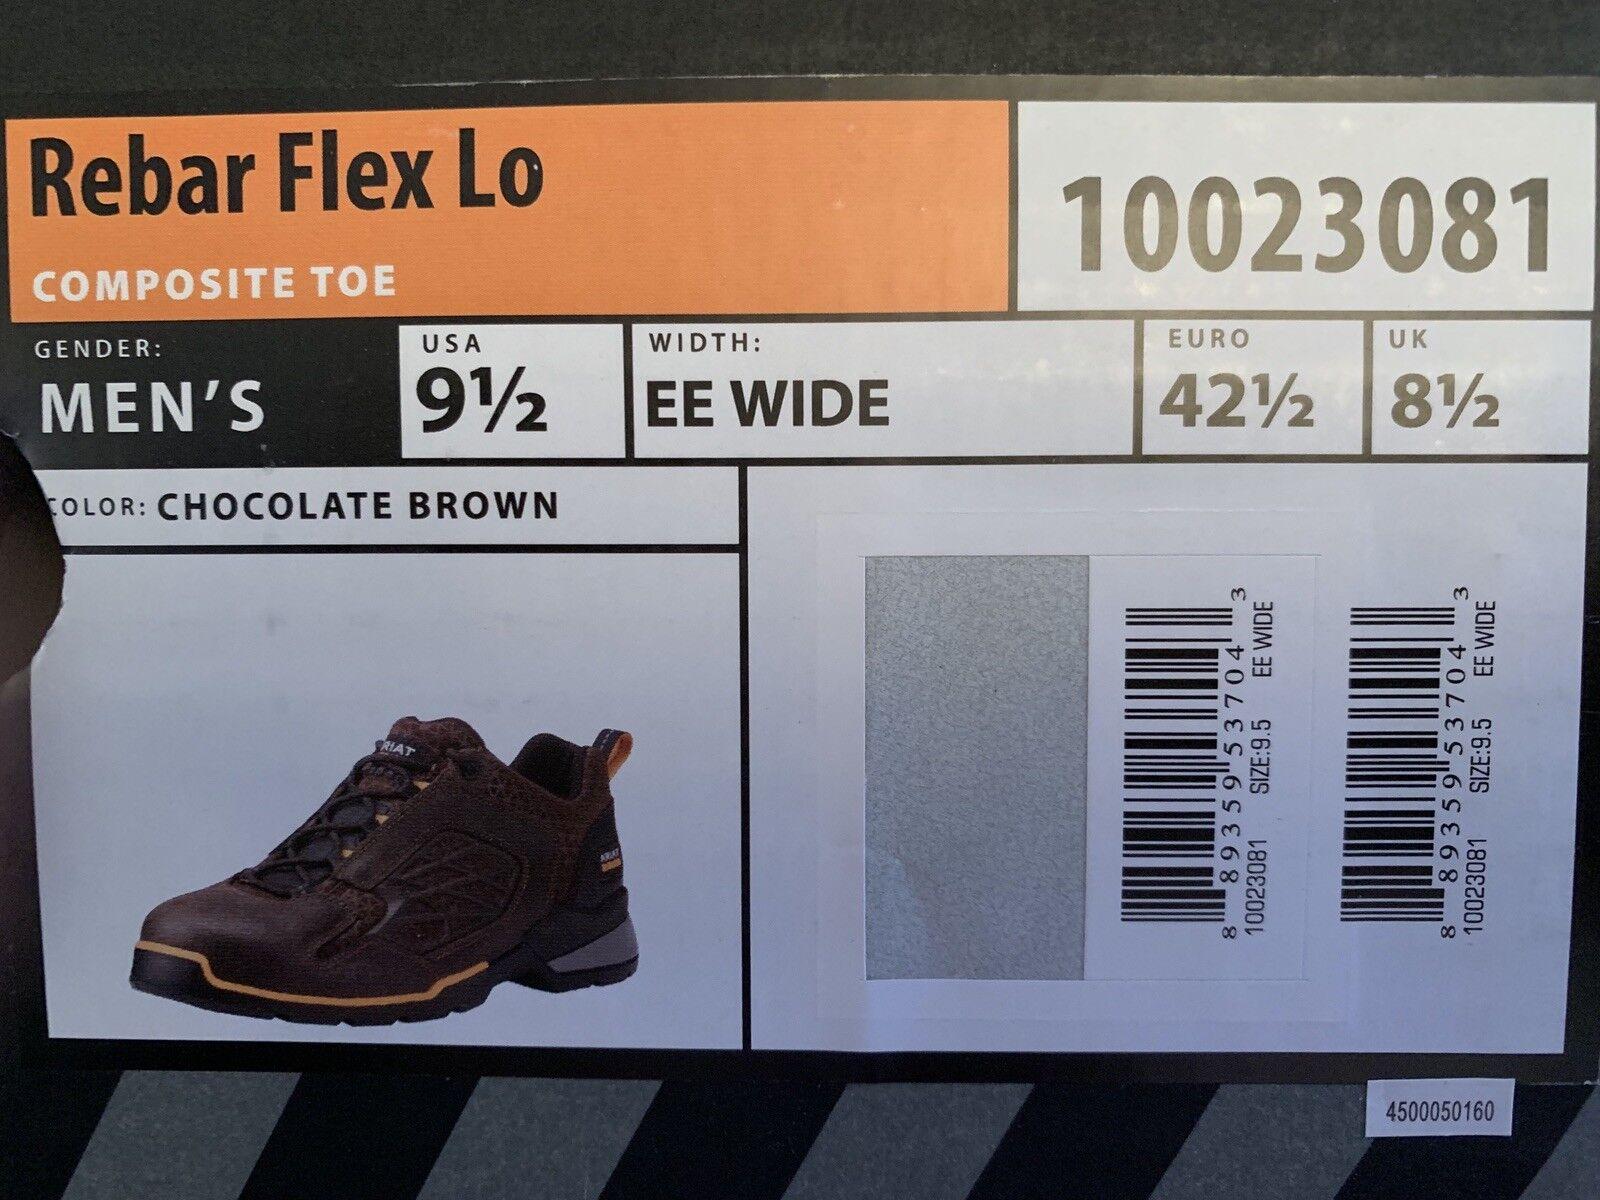 ARIAT travail-REBAR FLEX Lo - 10023081-Hommes 's Extra grand grand Marron Chocolat